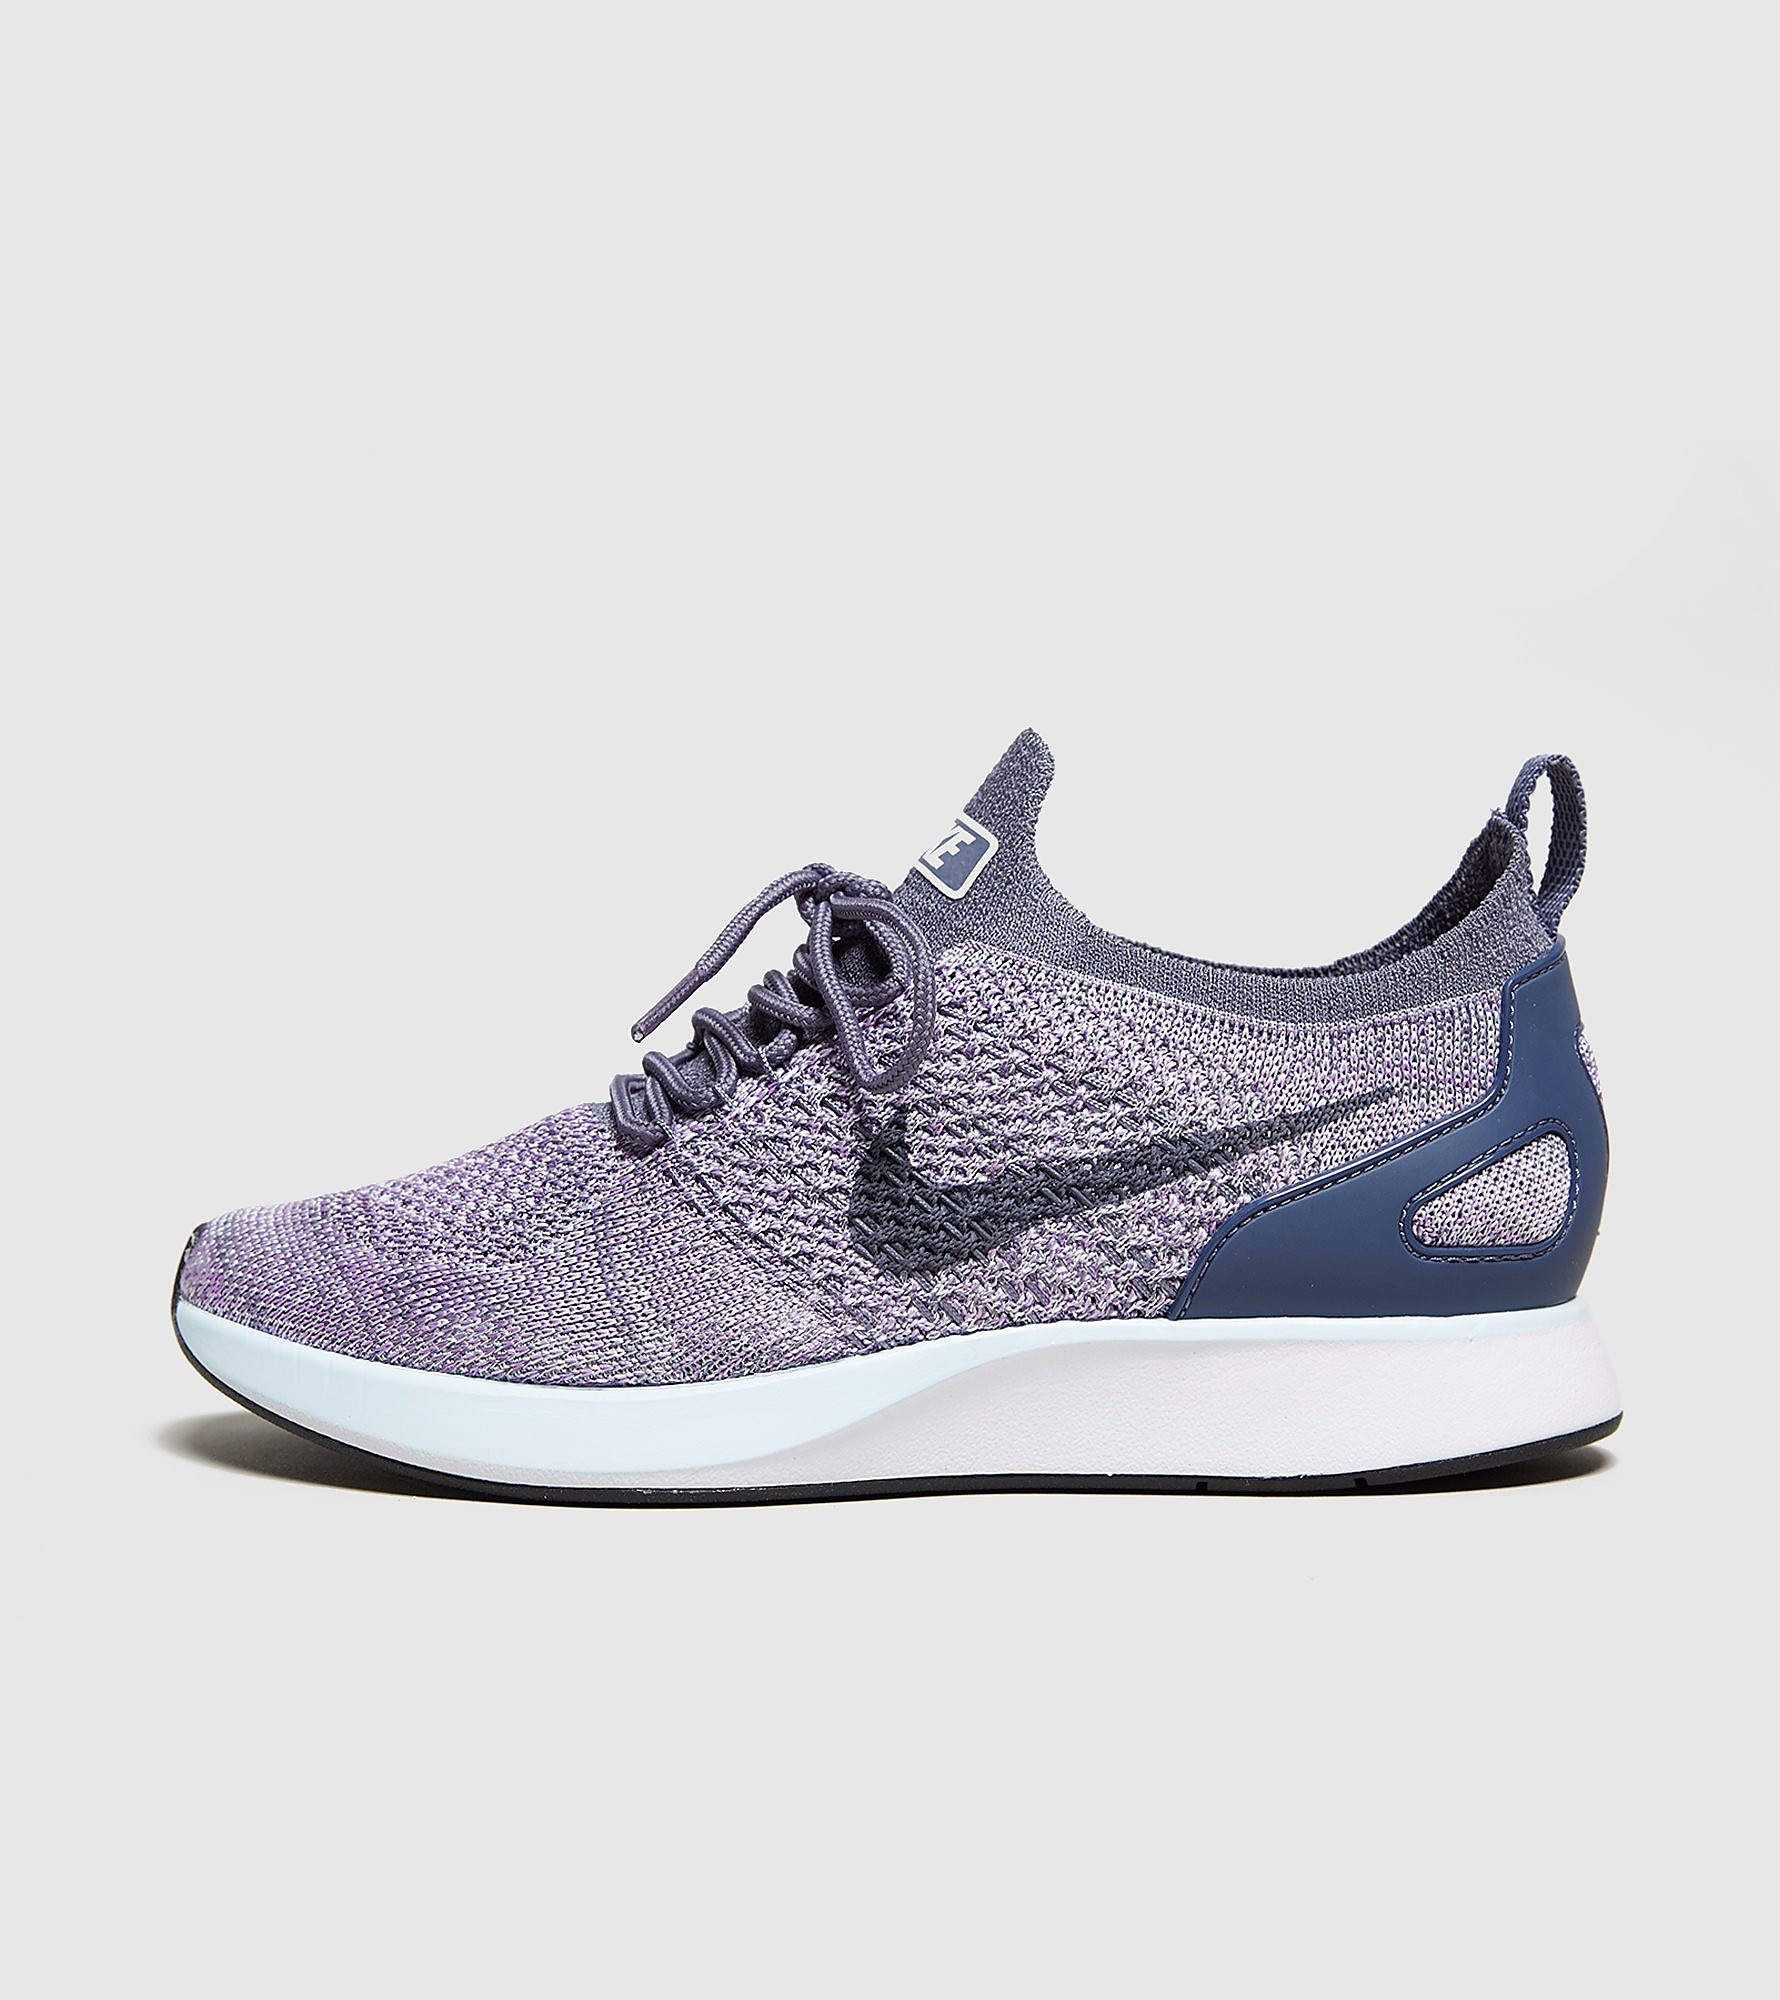 Nike Air Zoom Mariah Flyknit Racer Dames